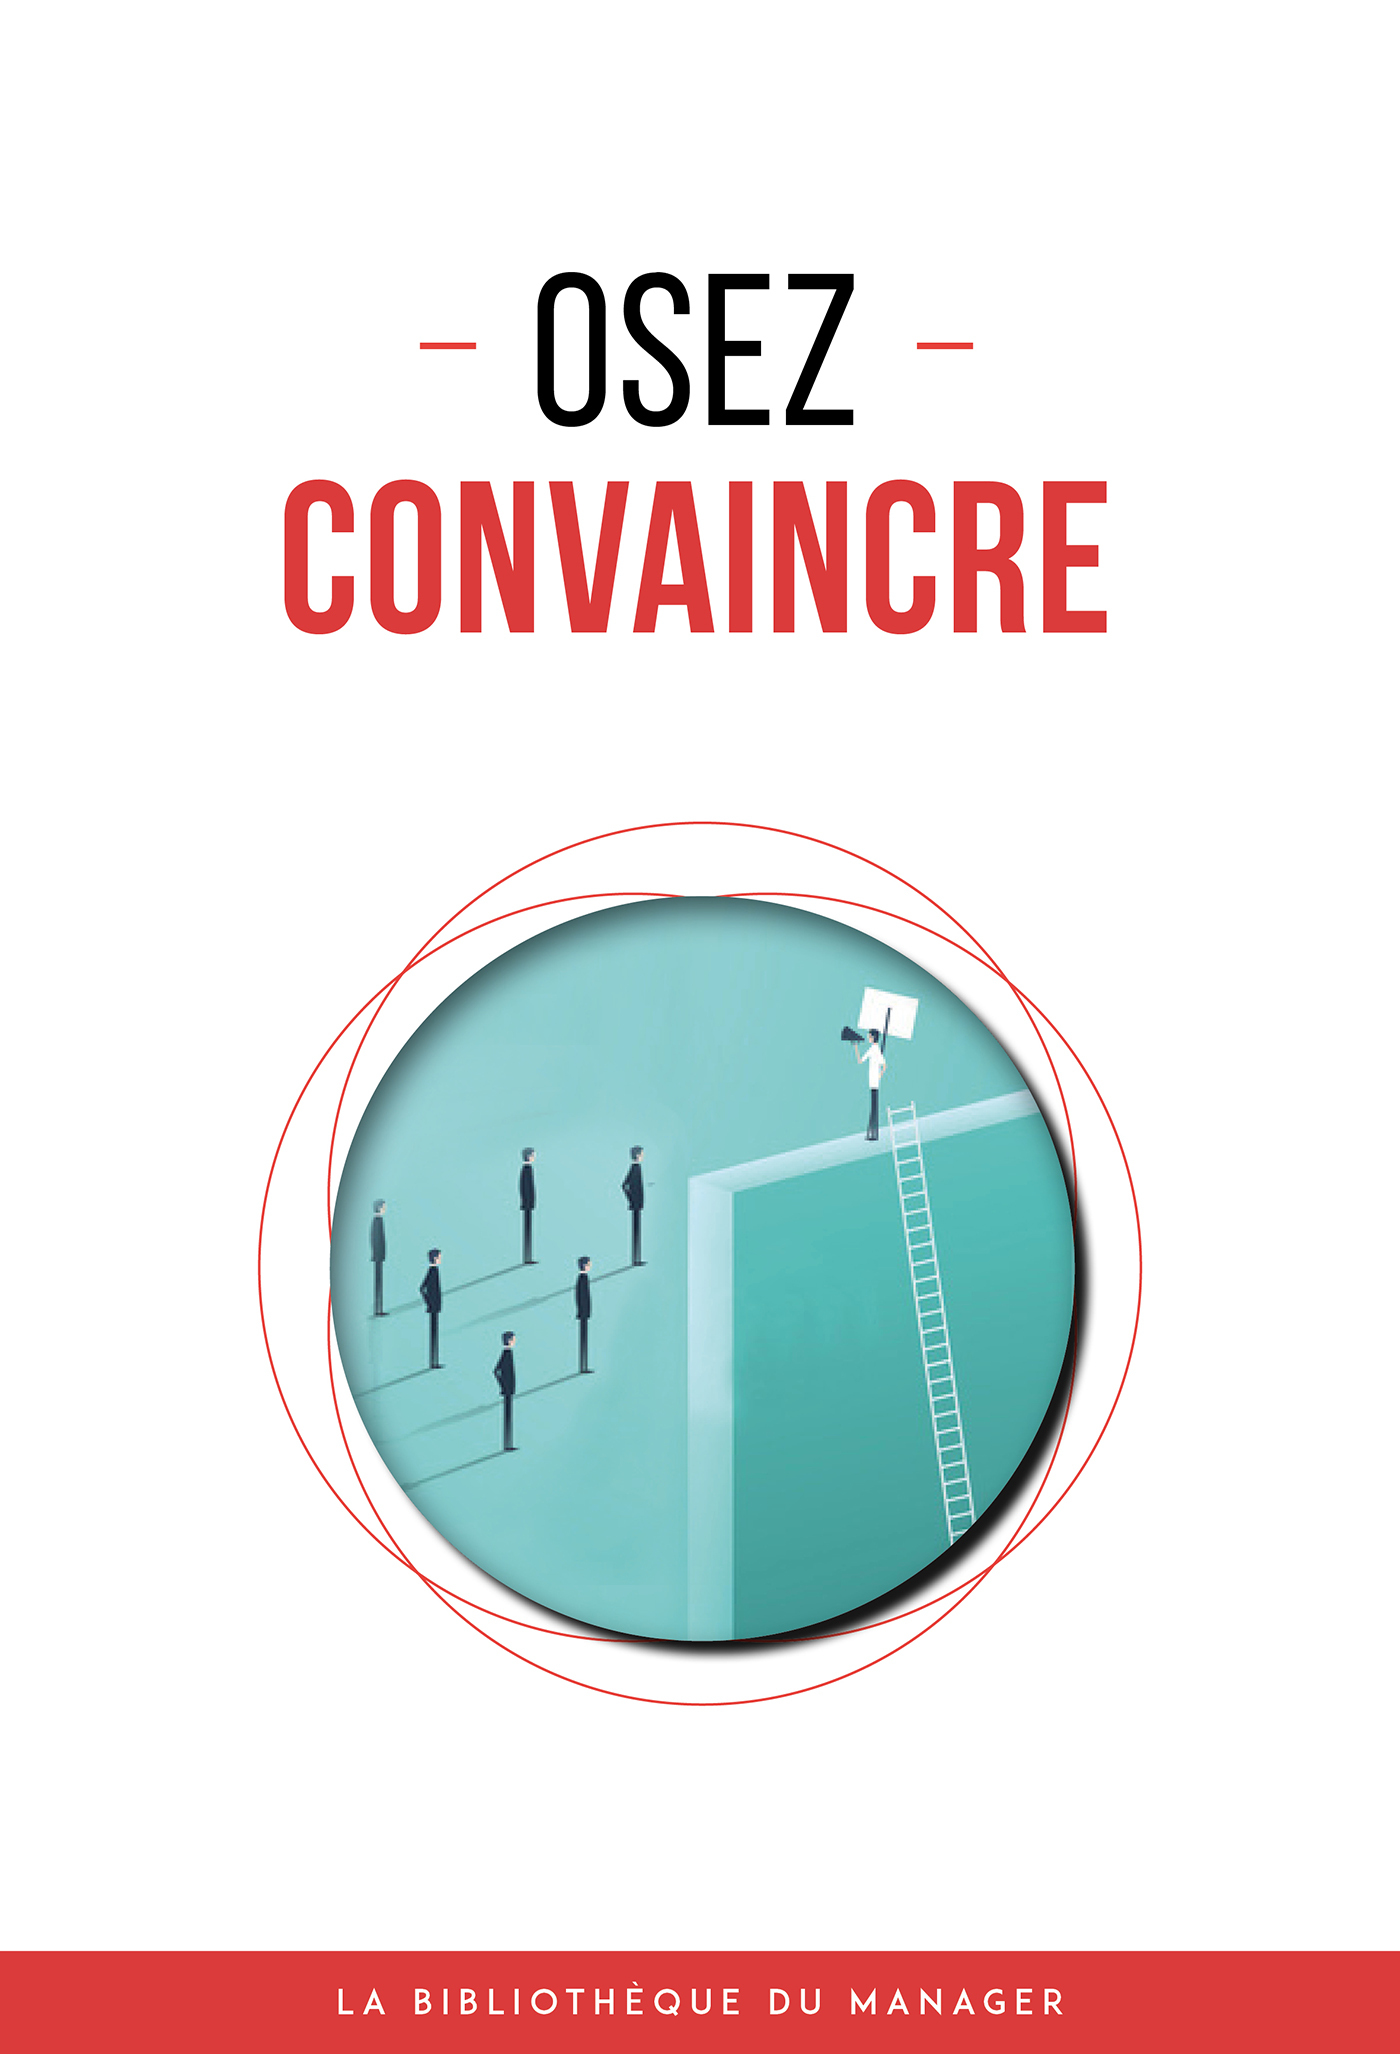 OSEZ CONVAINCRE